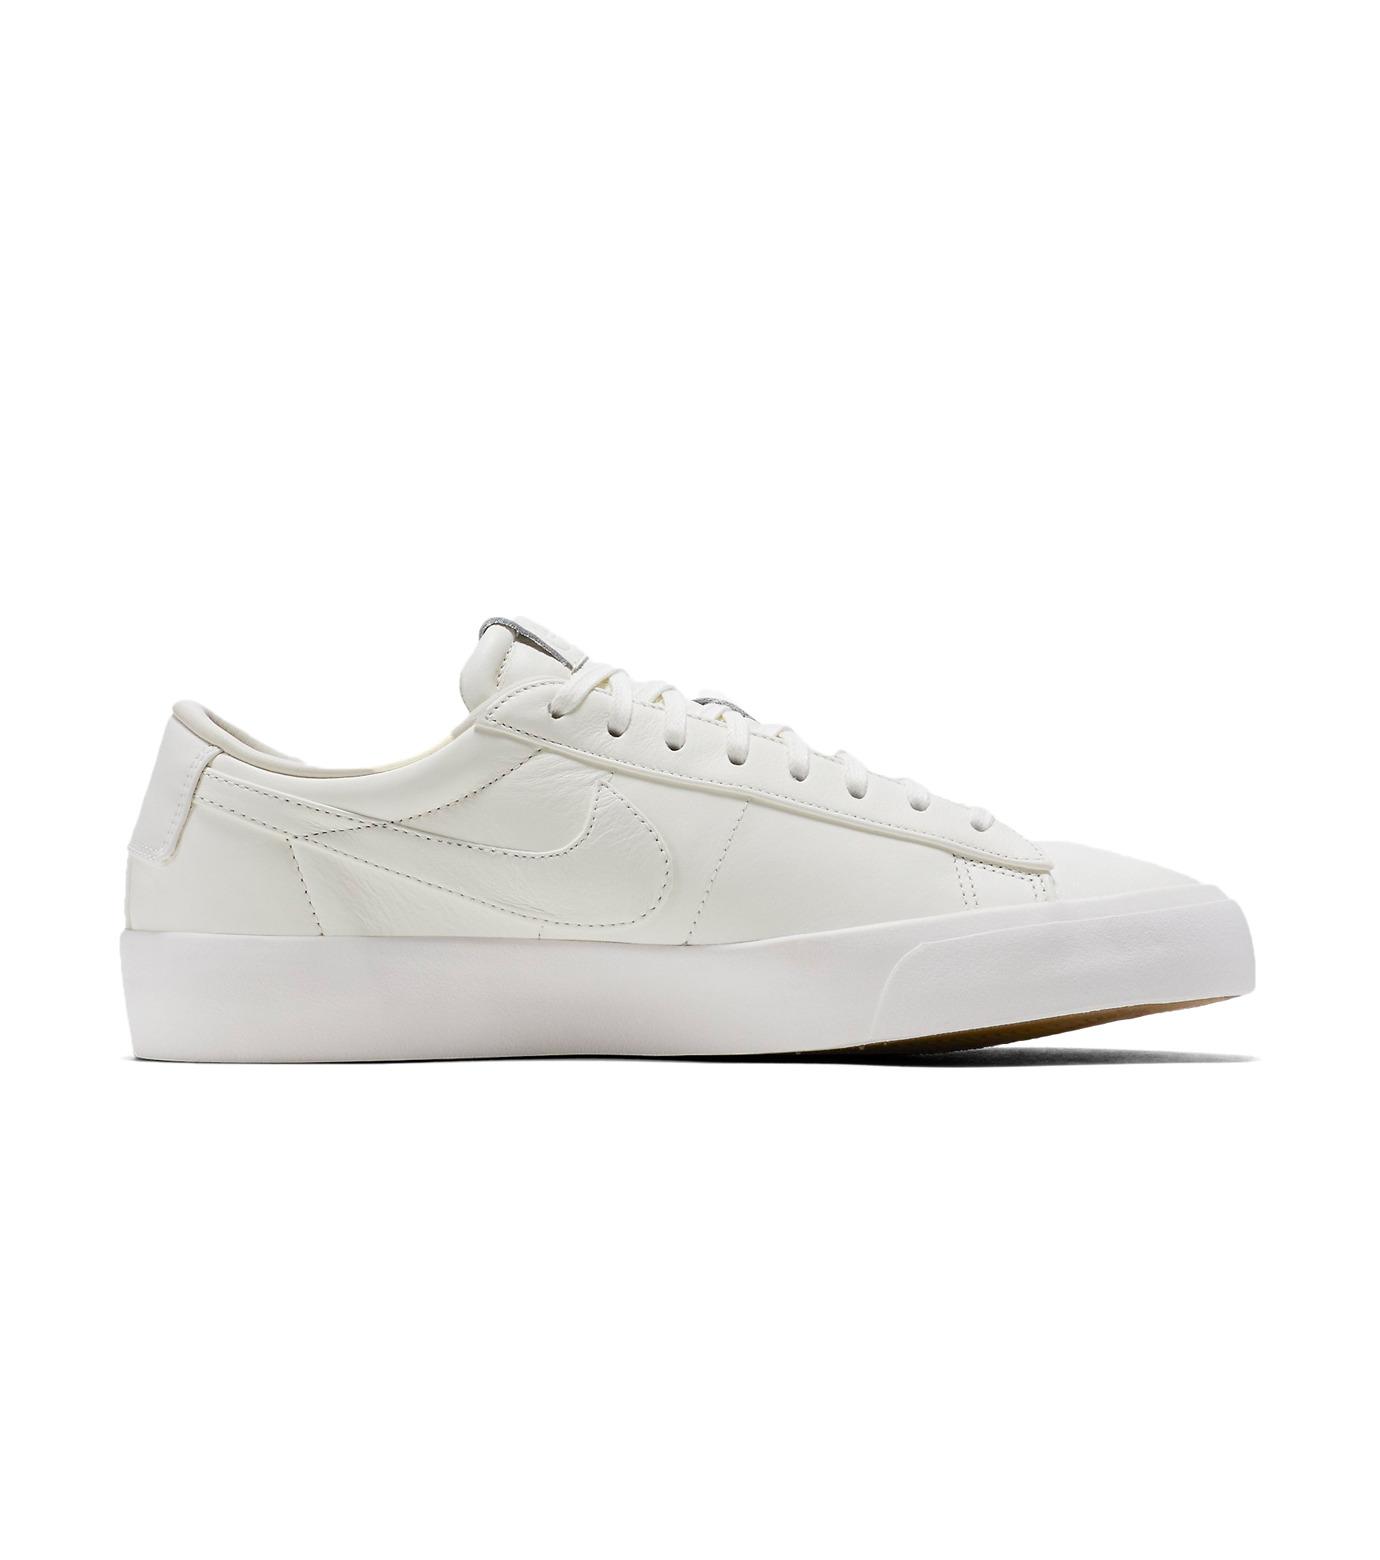 NIKE(ナイキ)のBLAZER STUDIO LOW-WHITE(シューズ/shoes)-904804-100-4 拡大詳細画像1